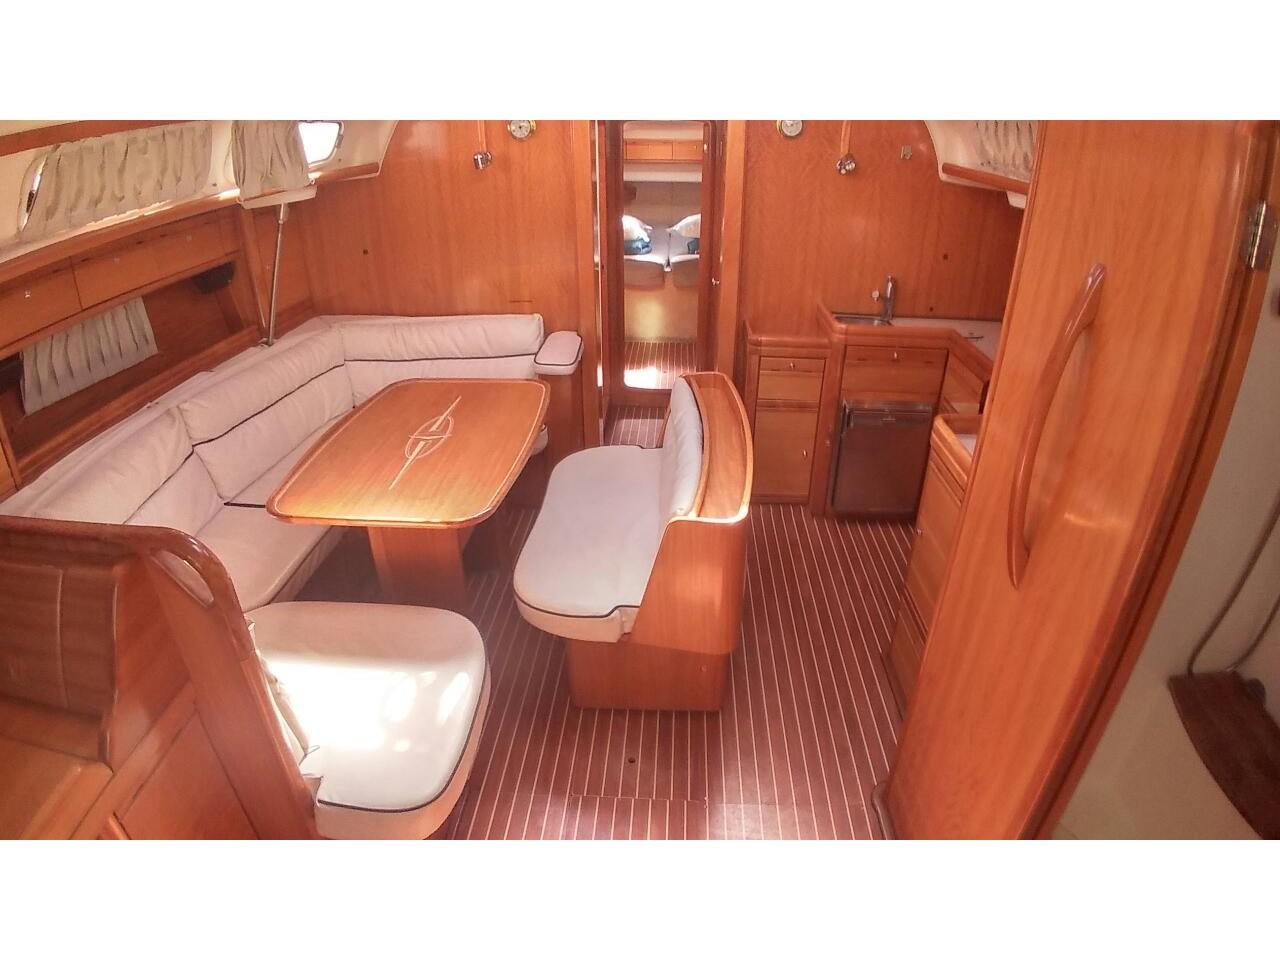 S/Y - Bavaria 46 Cruiser - 4 Cabins - Built 2008